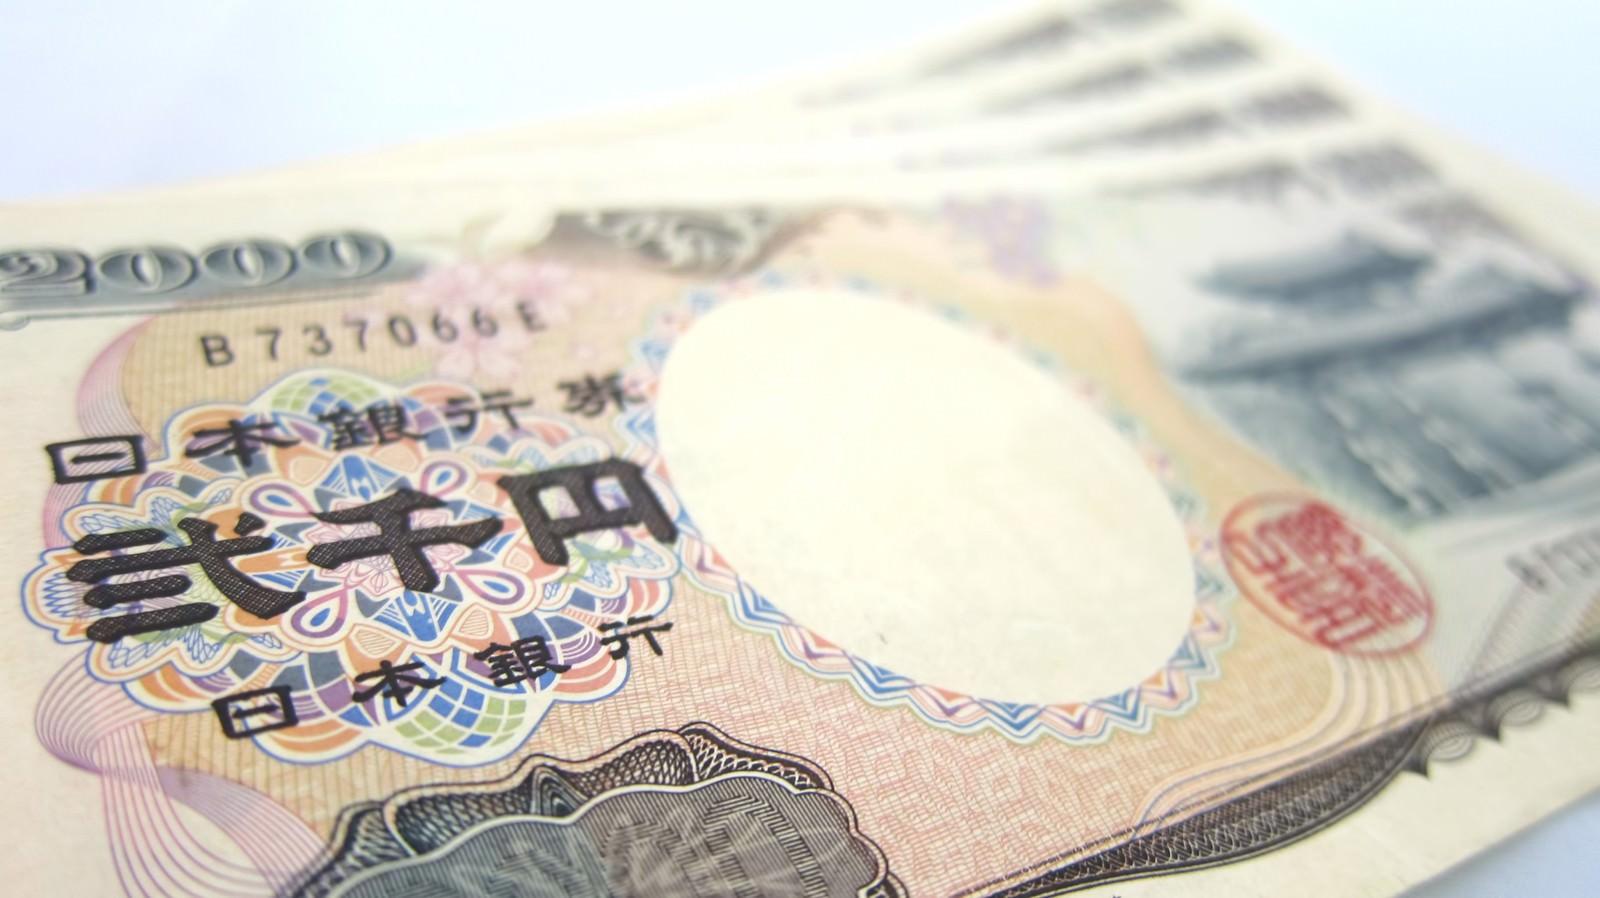 N752 2senensatu TP V 2000 yen bill